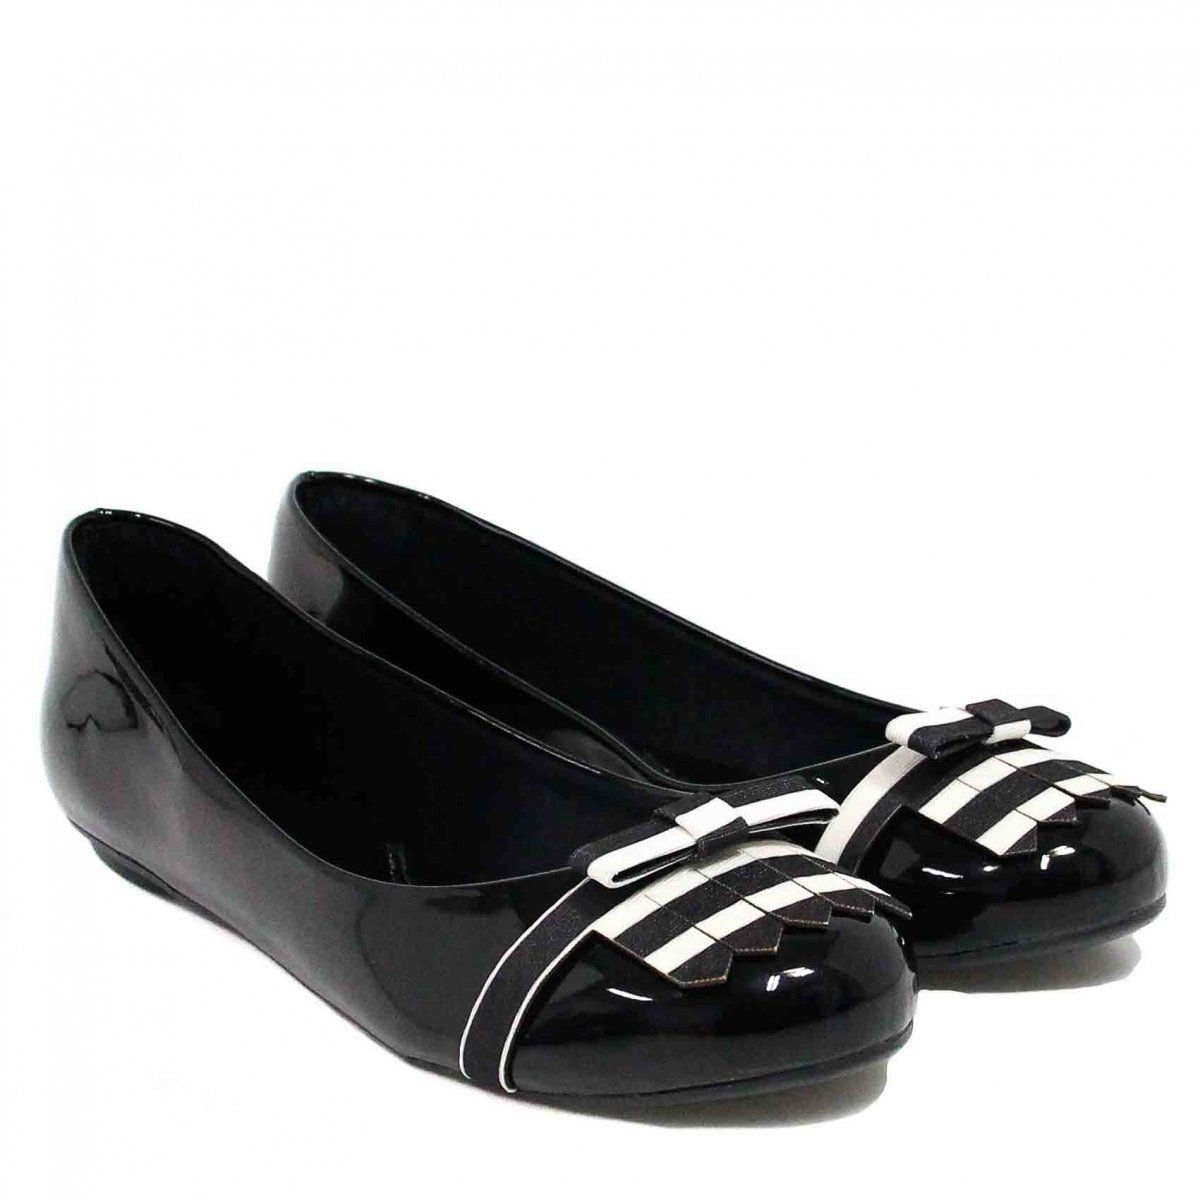 Verniz Zariff Zariff Franja Shoes Laço Shoes Sapatilha Preto Sapatilha pHfwPY